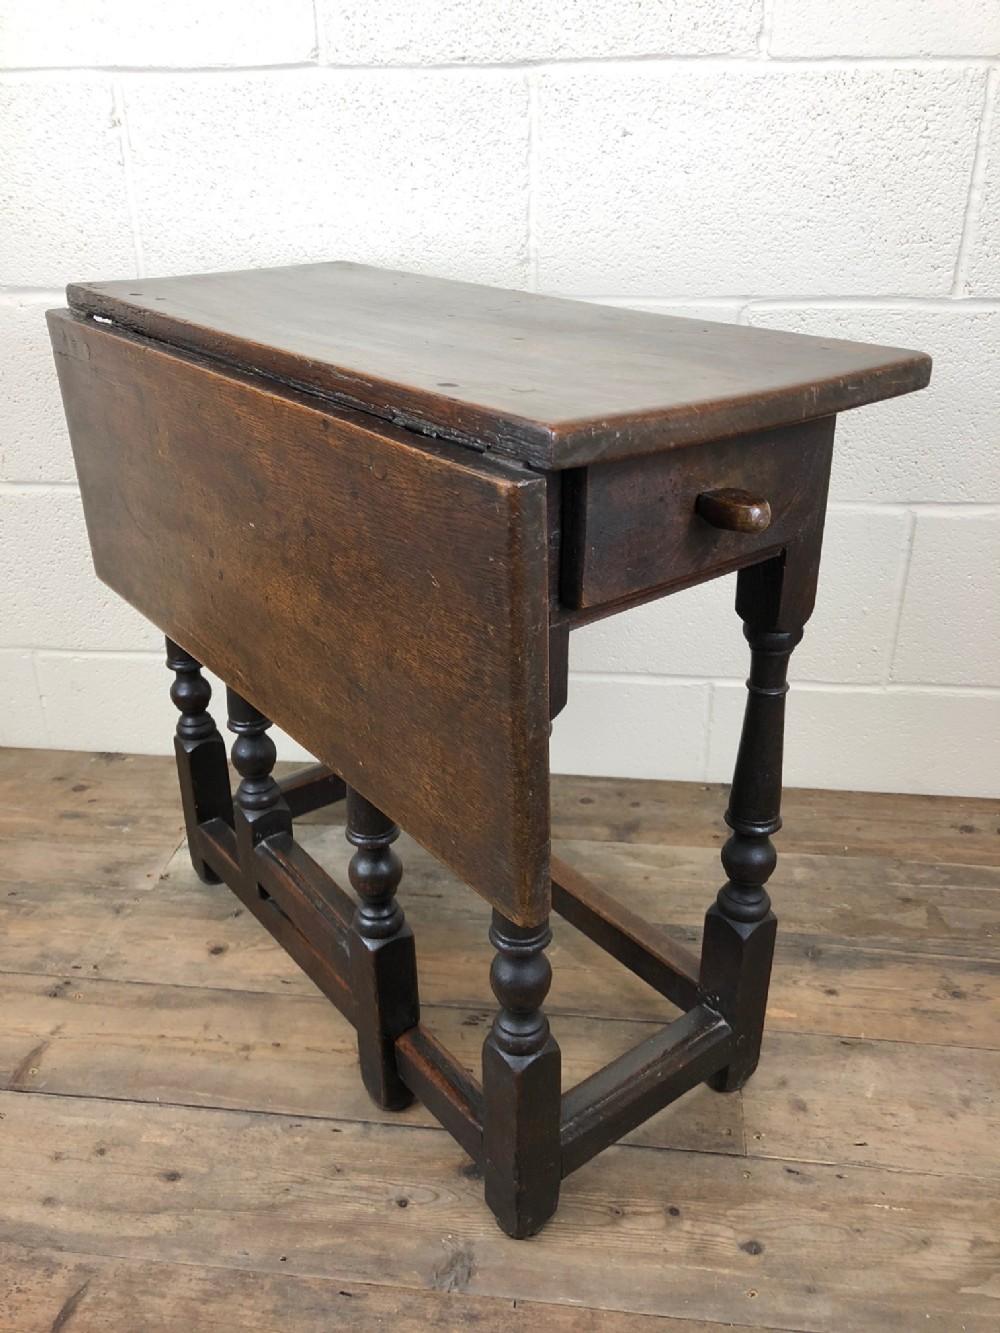 18th century antique oak gate leg yeomans table